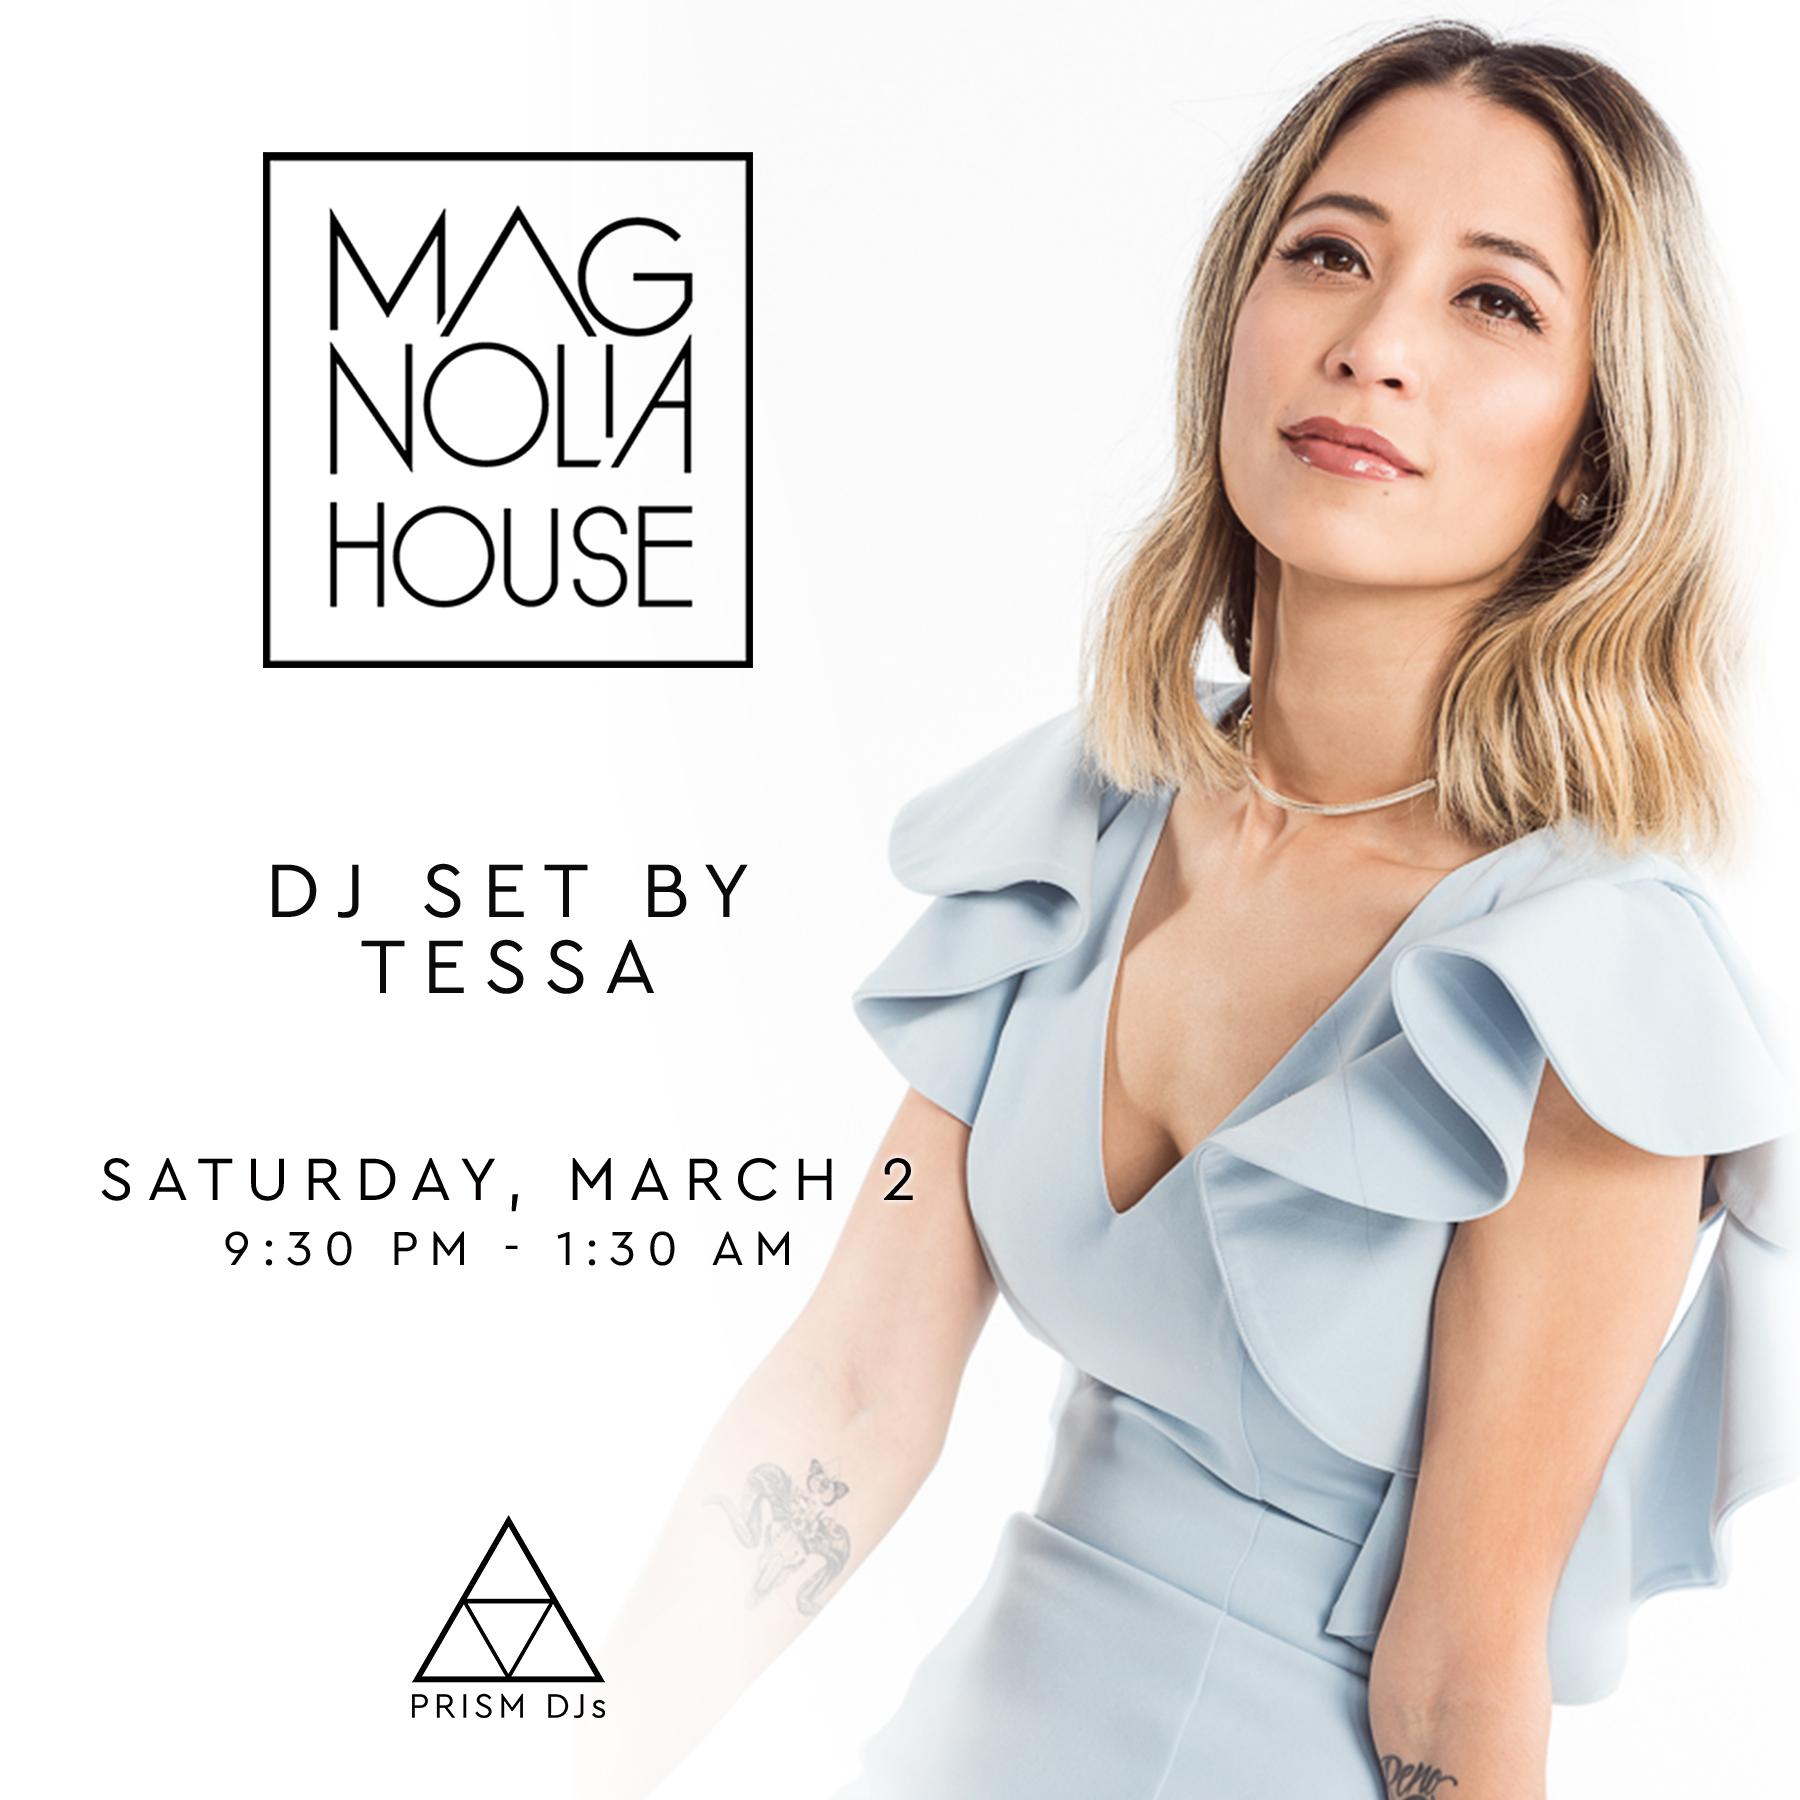 Magnolia House_V2018 Flyer_Tessa.jpg